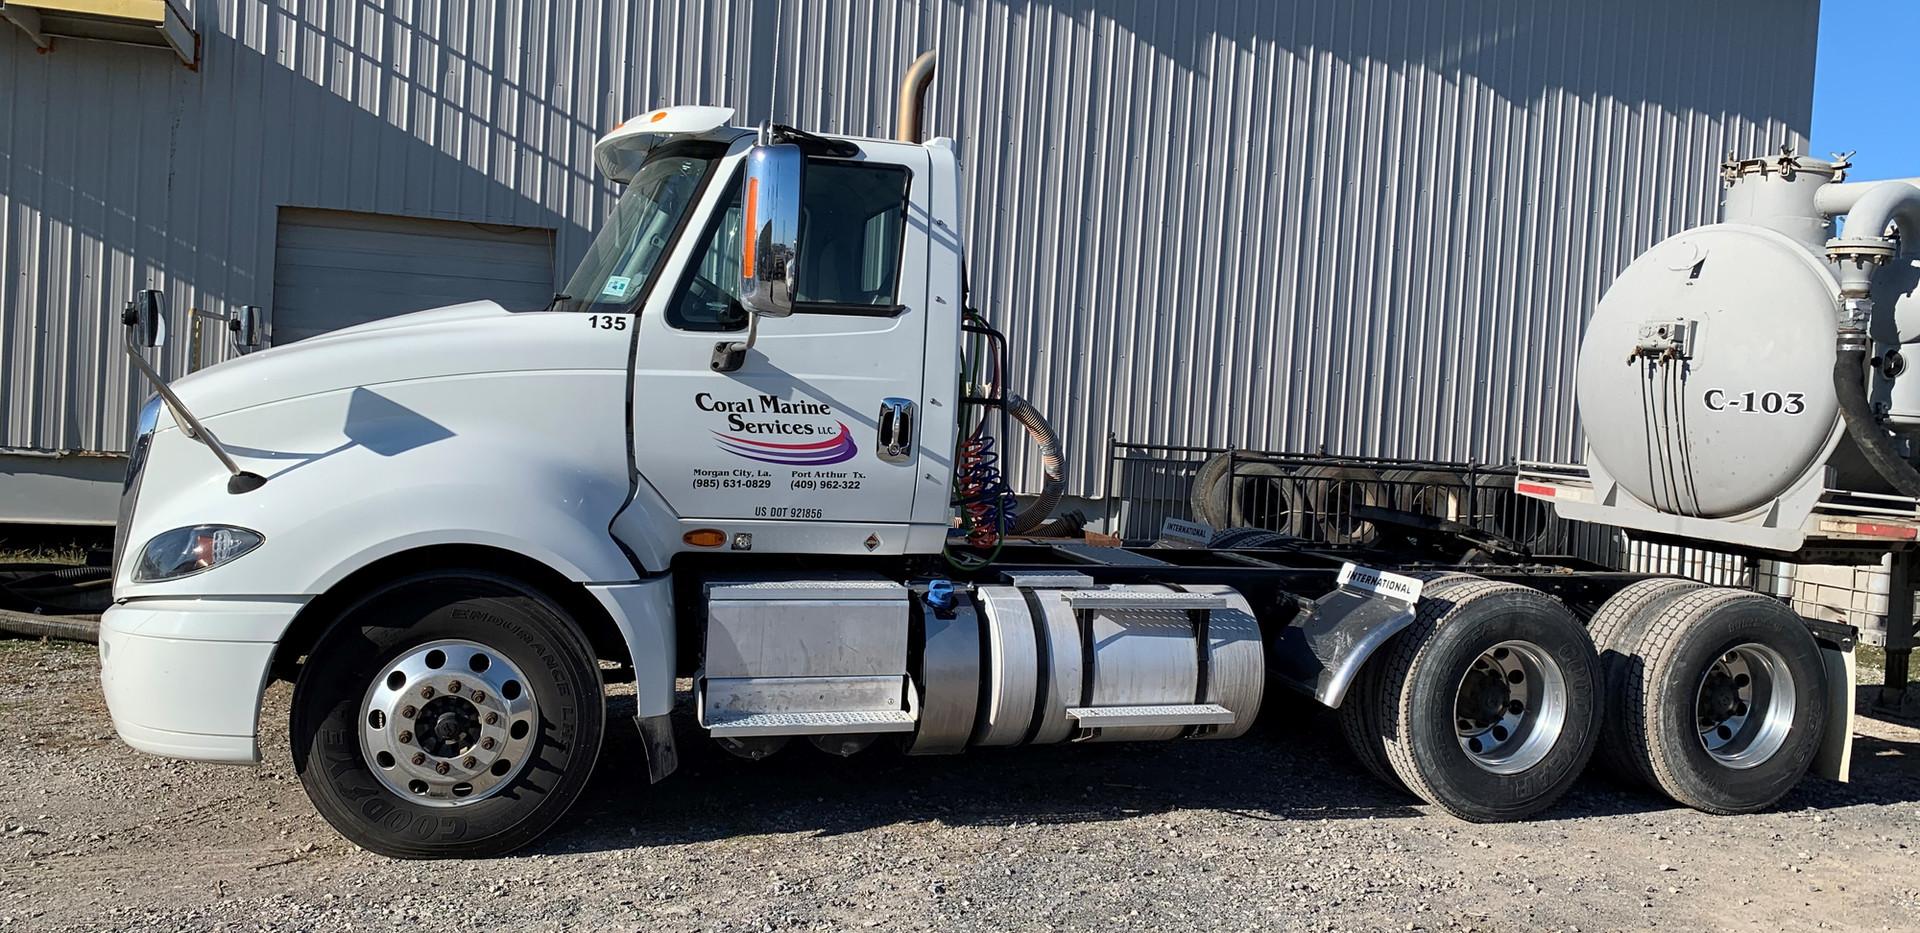 Truck # c-109.jpg